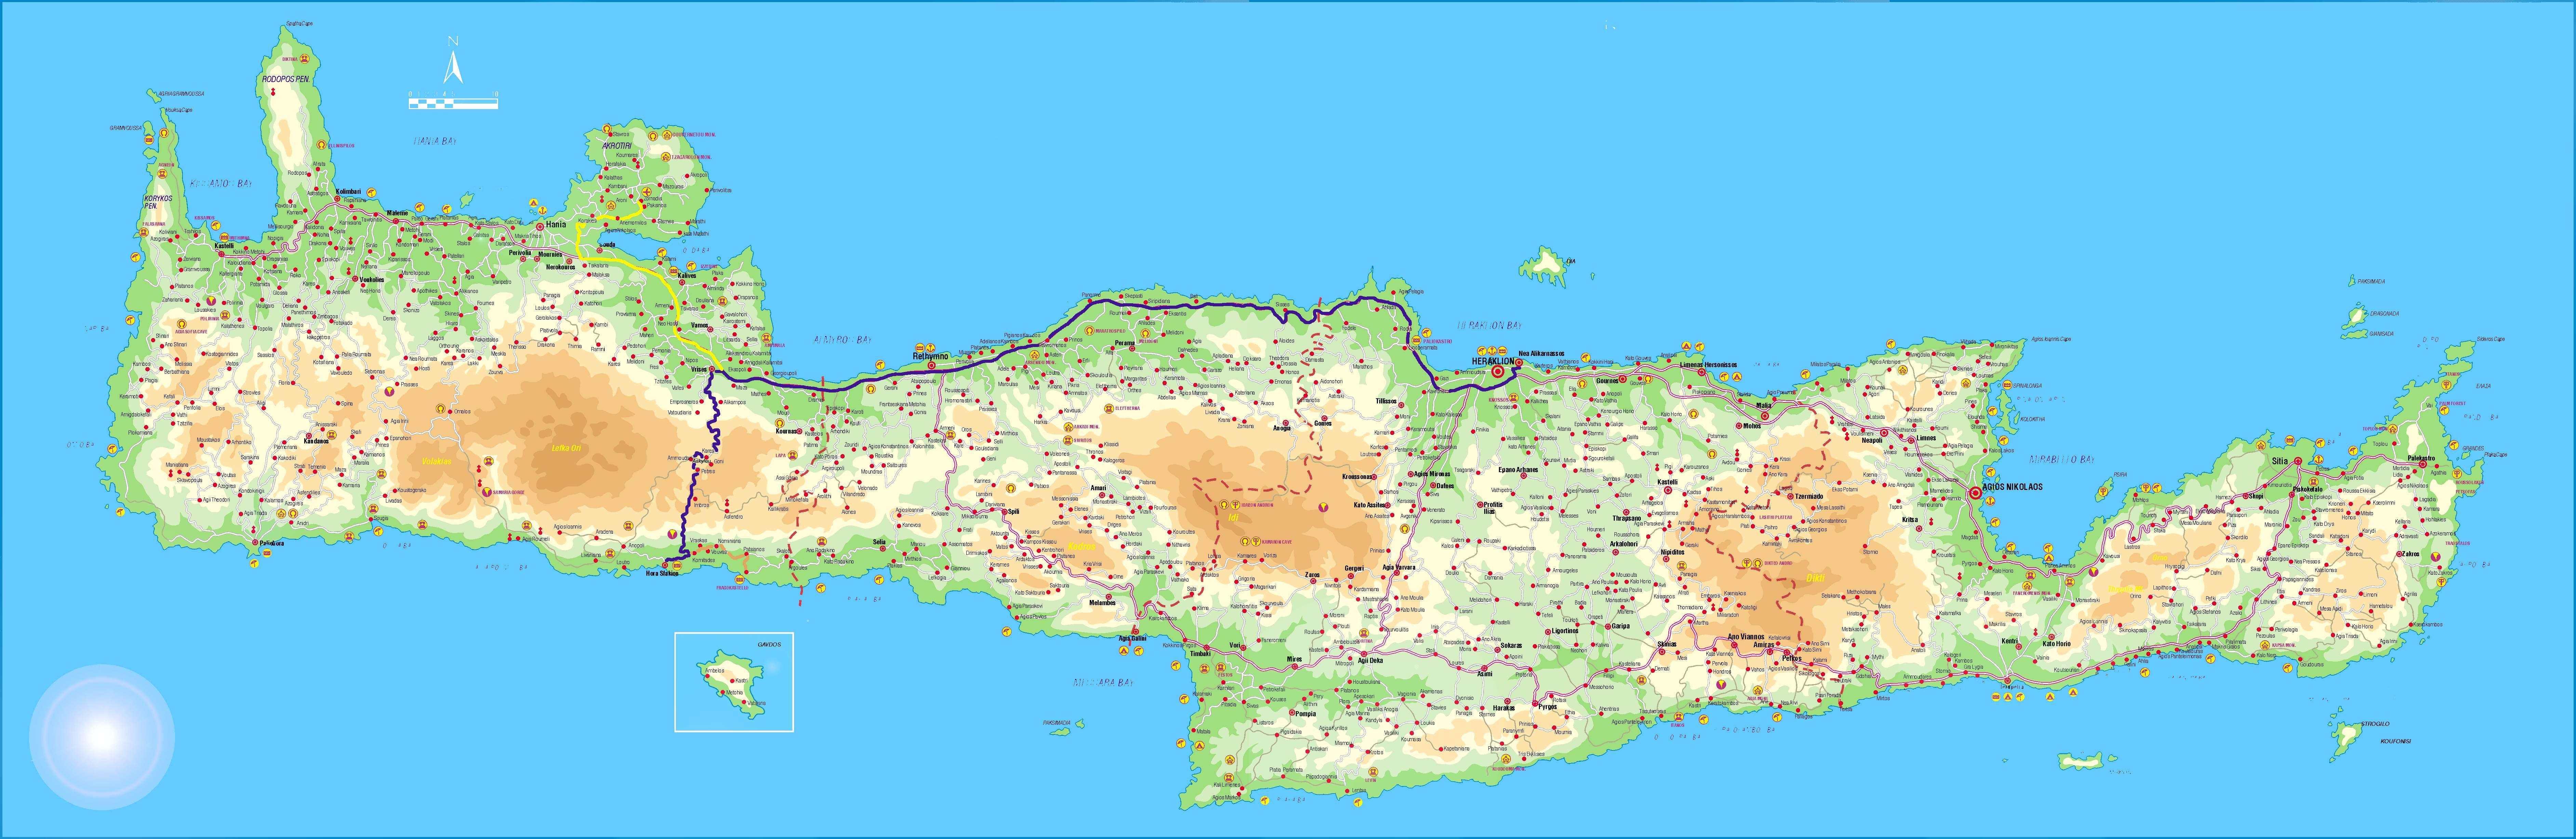 Harta Insula Creta Harta Insula Creta Harti Insula Creta Harti